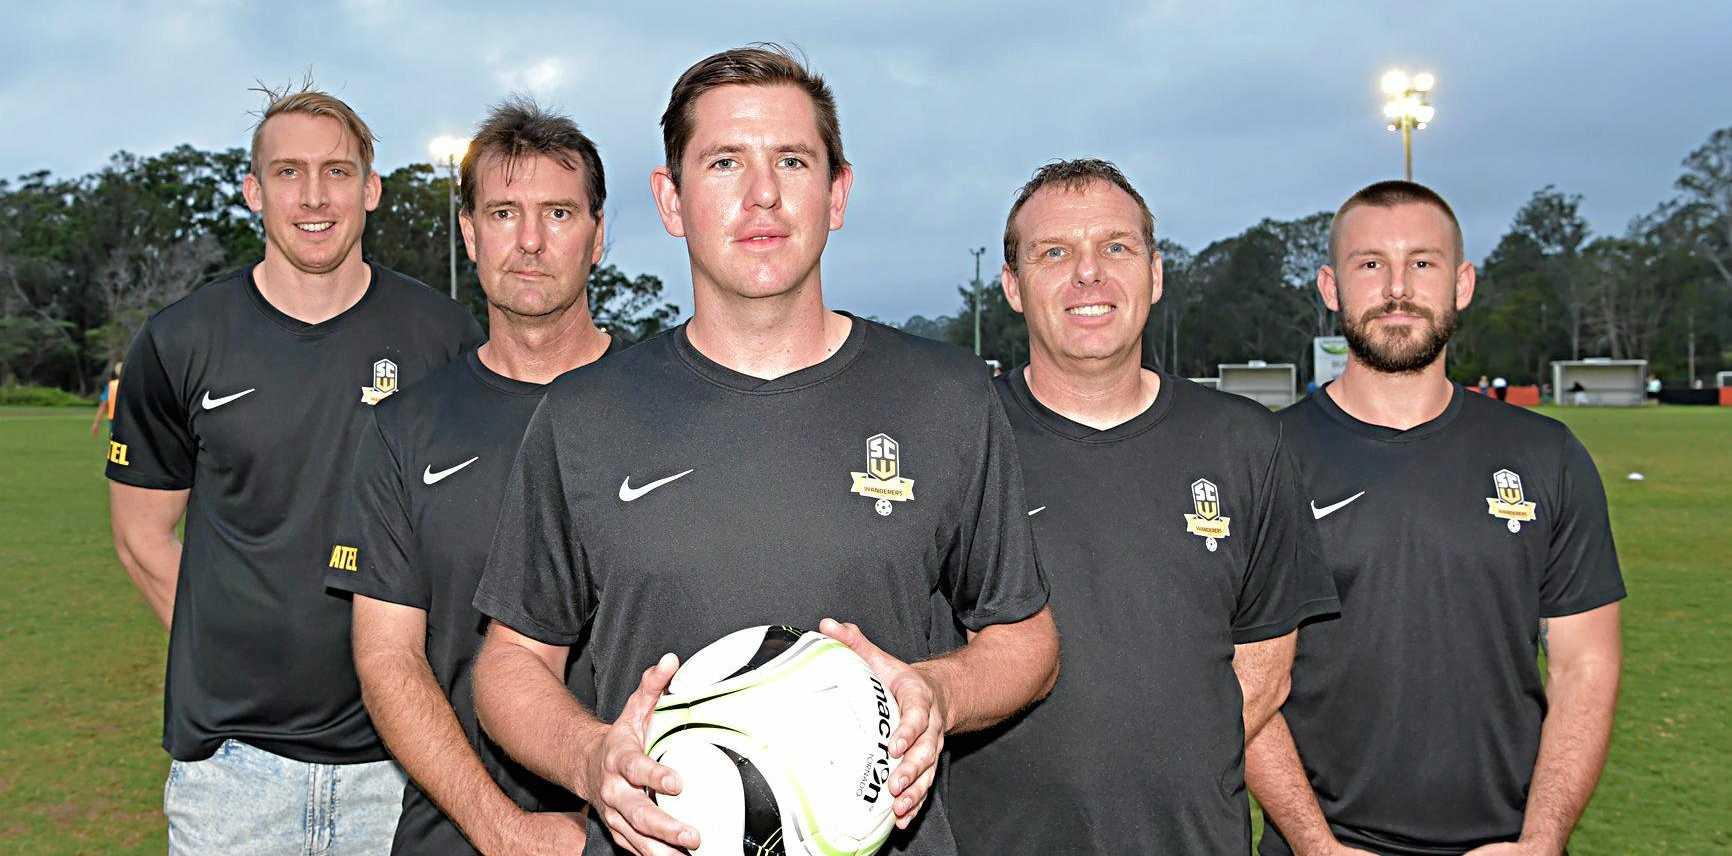 WANDERERS: Joel Coucaud, assistant coach Warren Crickmore, Ray Schultz, coach Matt Chandler and Nick Arden will be part of the team's inaugural soccer season.